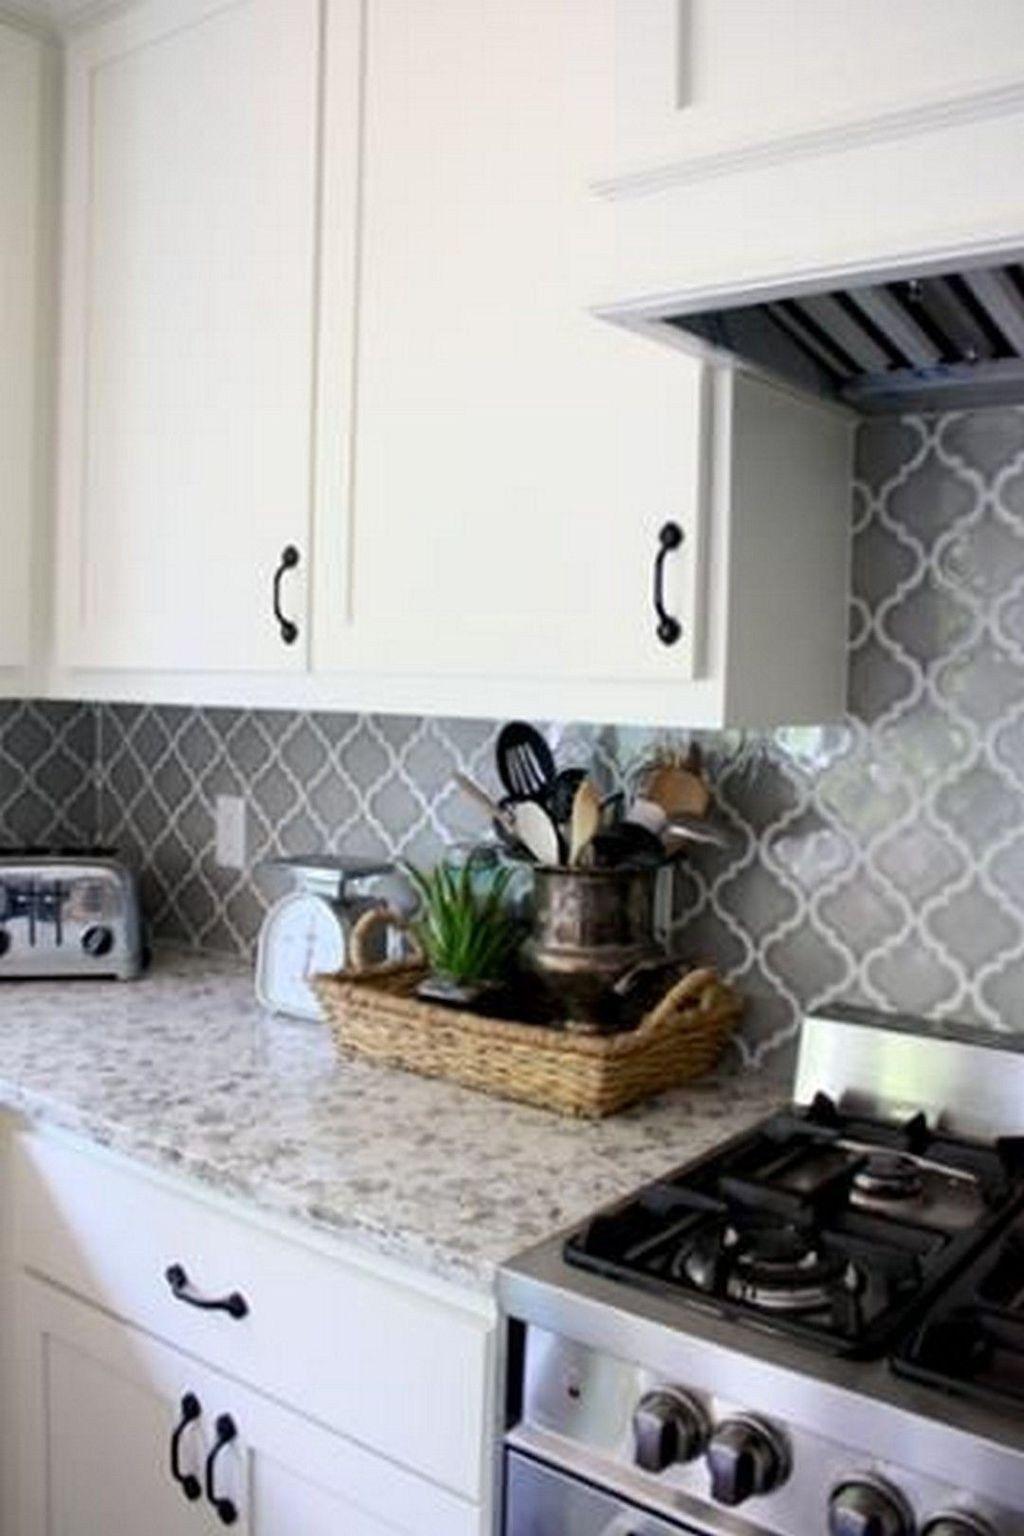 Excellent Pic Modern Farmhouse Backsplash Popular Country Chic Living S Come A Long Way Si Kitchen Design White Kitchen Backsplash Farmhouse Kitchen Backsplash